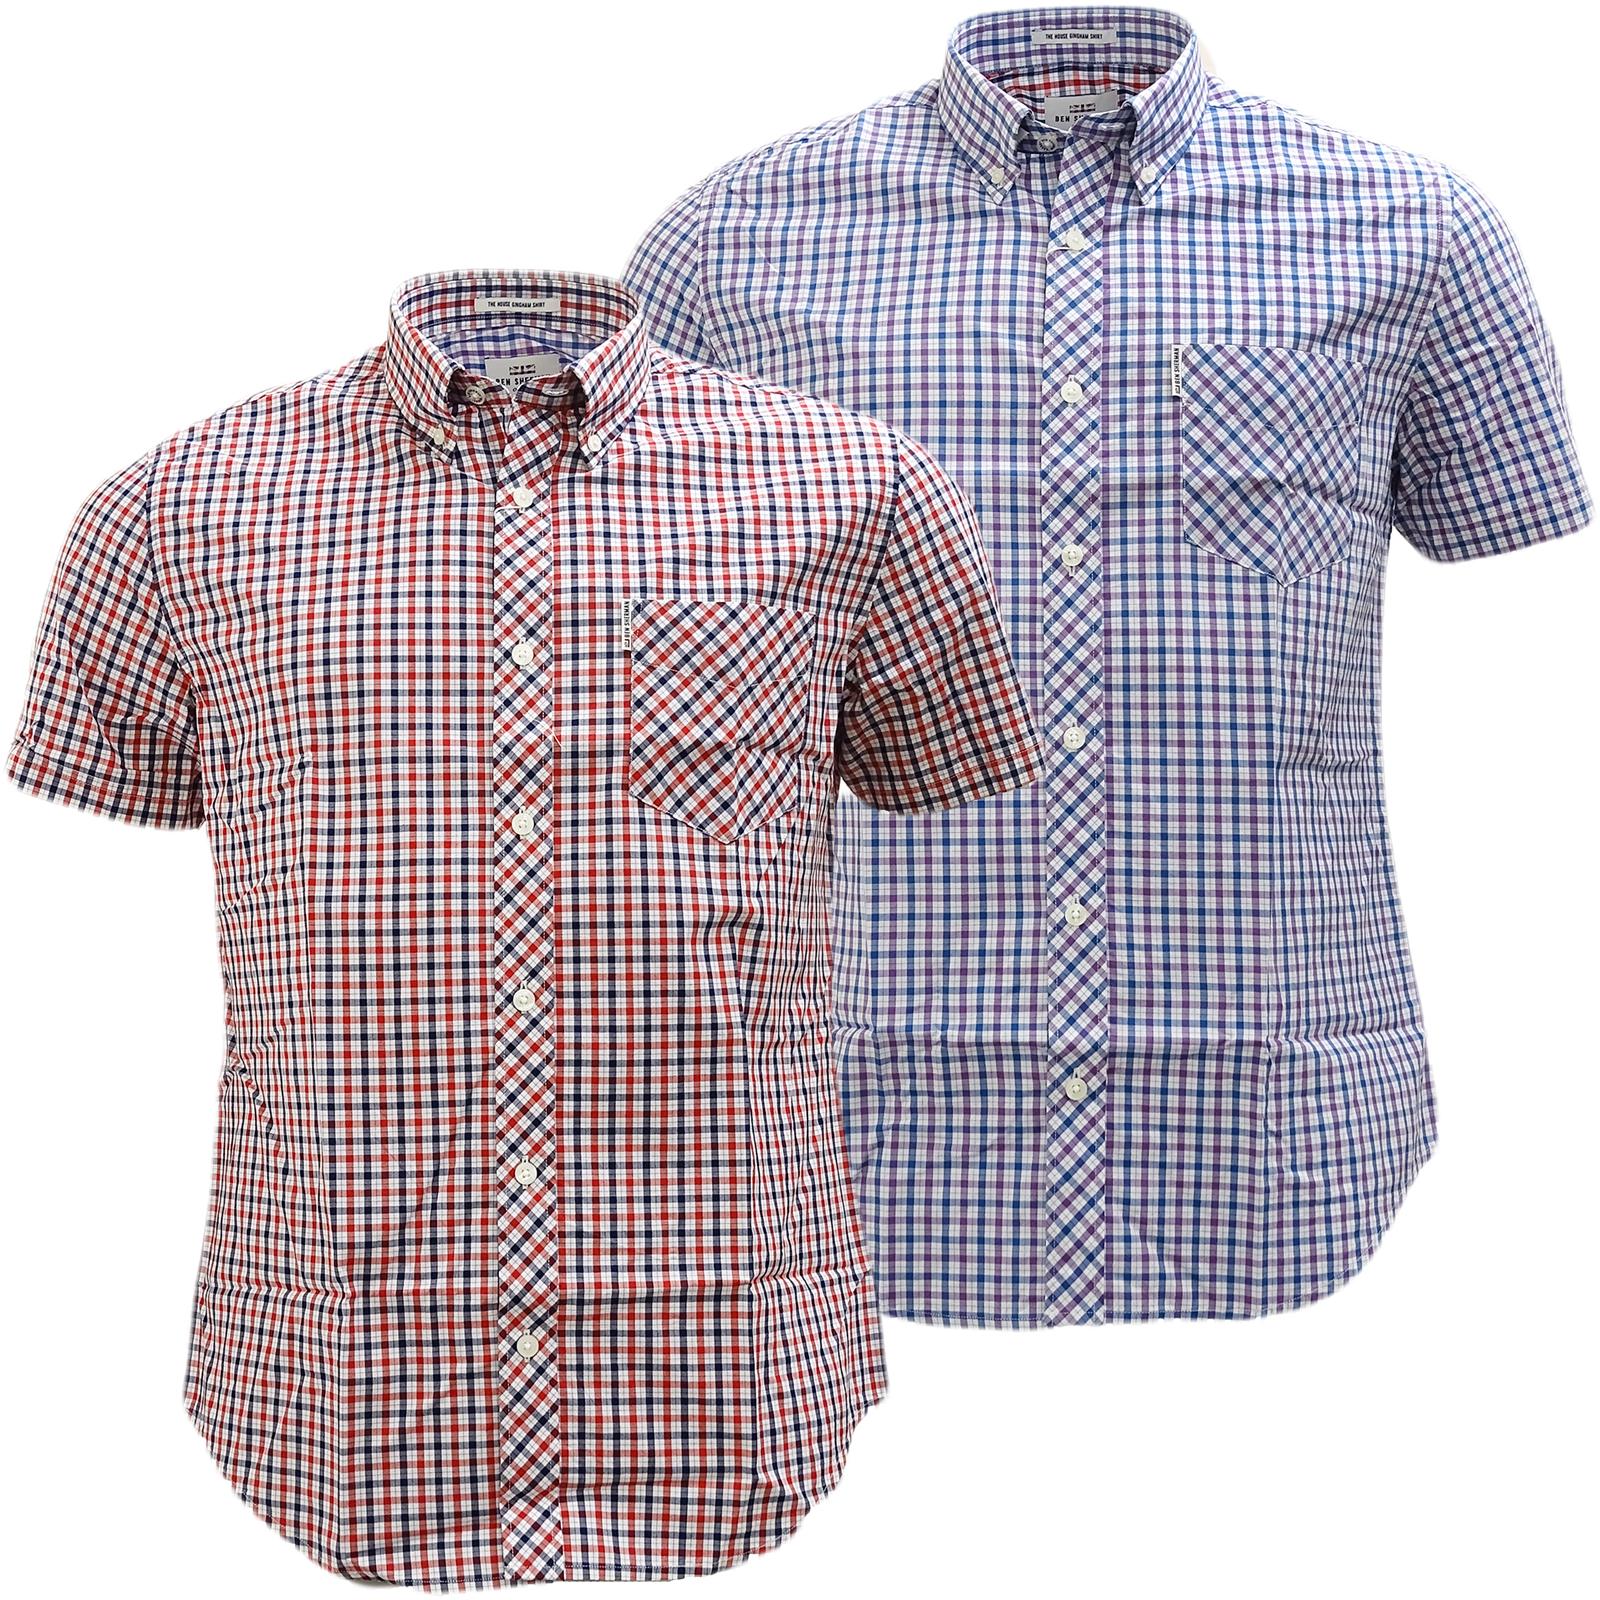 Ben Sherman Button Down Gingham House Check Shirt 47952